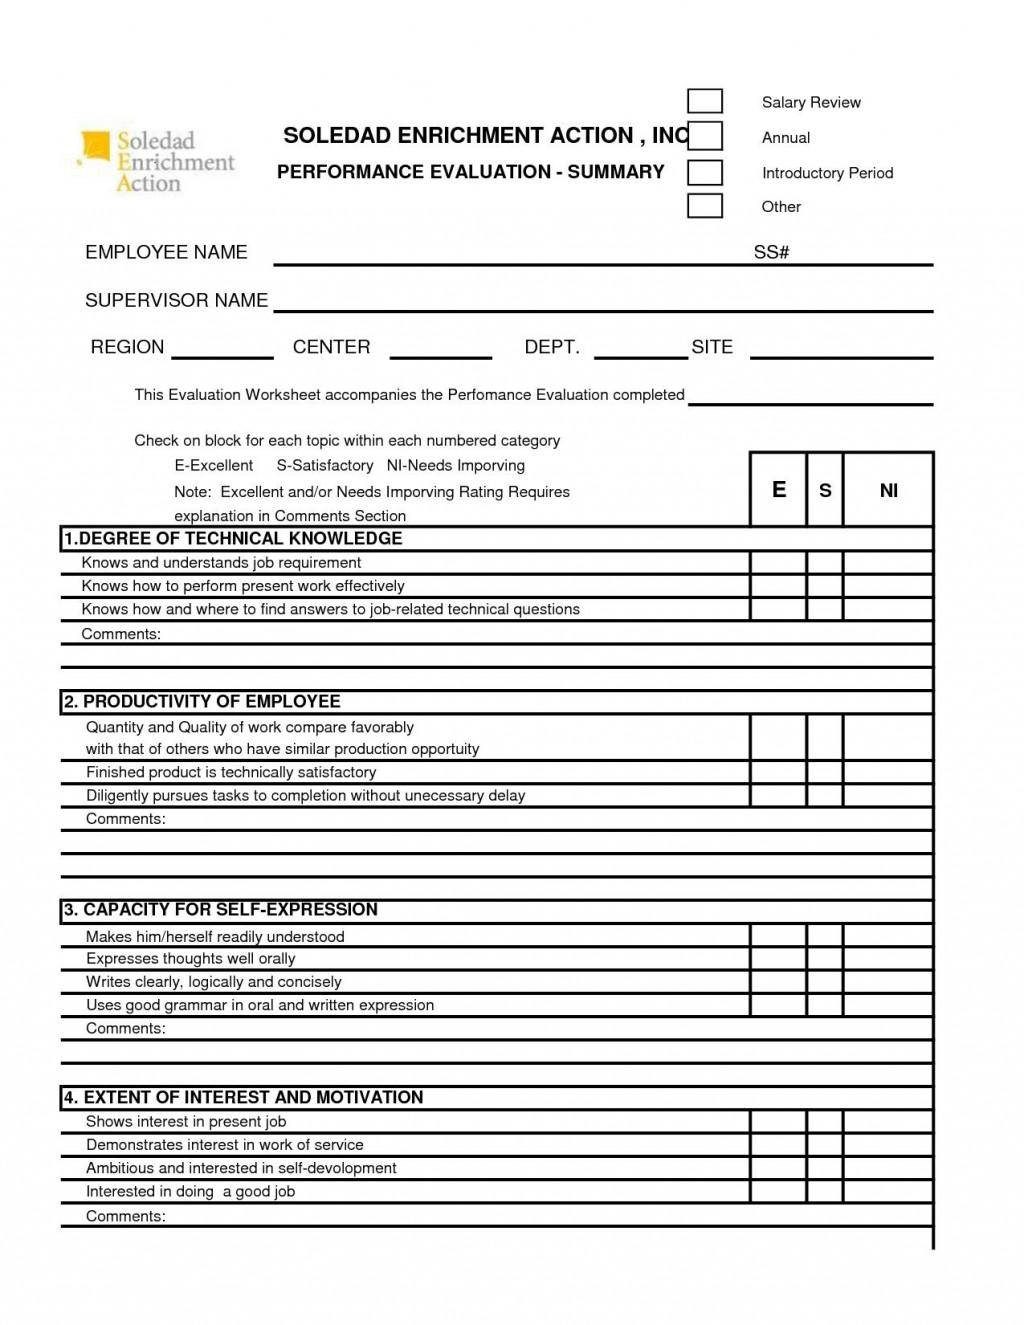 001 Sensational Employee Performance Evaluation Template High Definition  Templates Doc Form Free Download Appraisal WordLarge